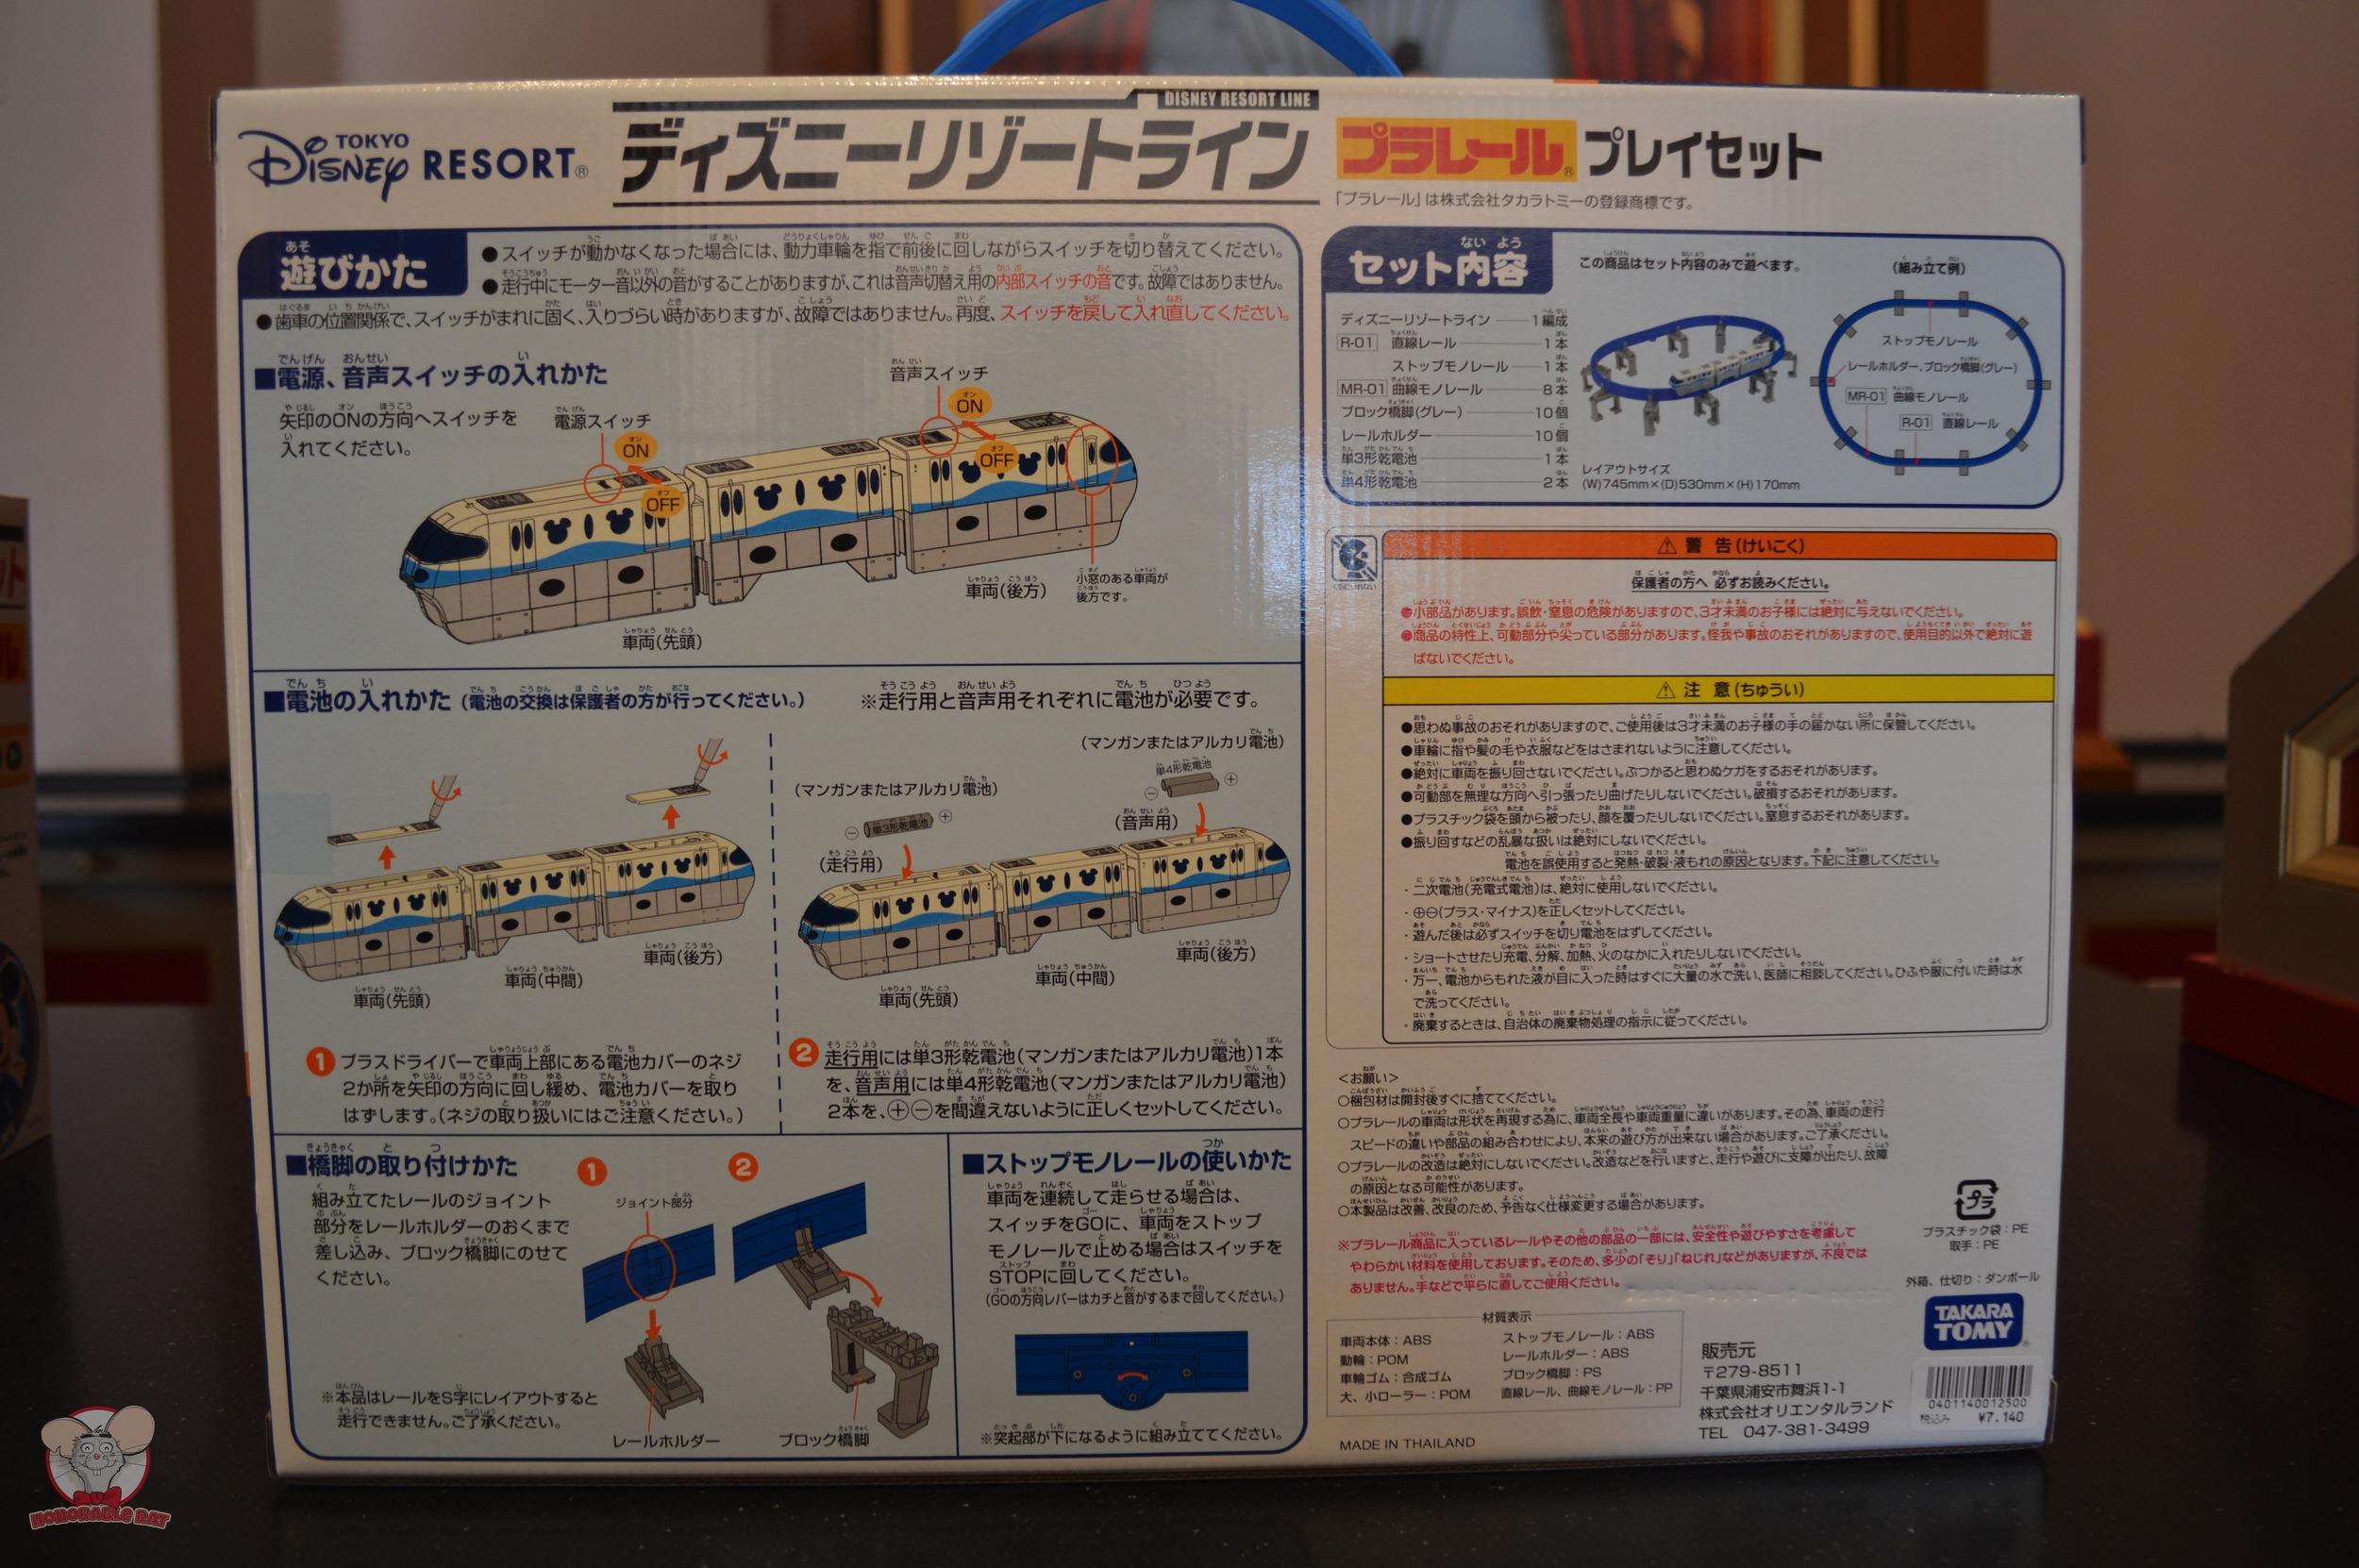 Tokyo Disney Resort Toy Monorail (Back)